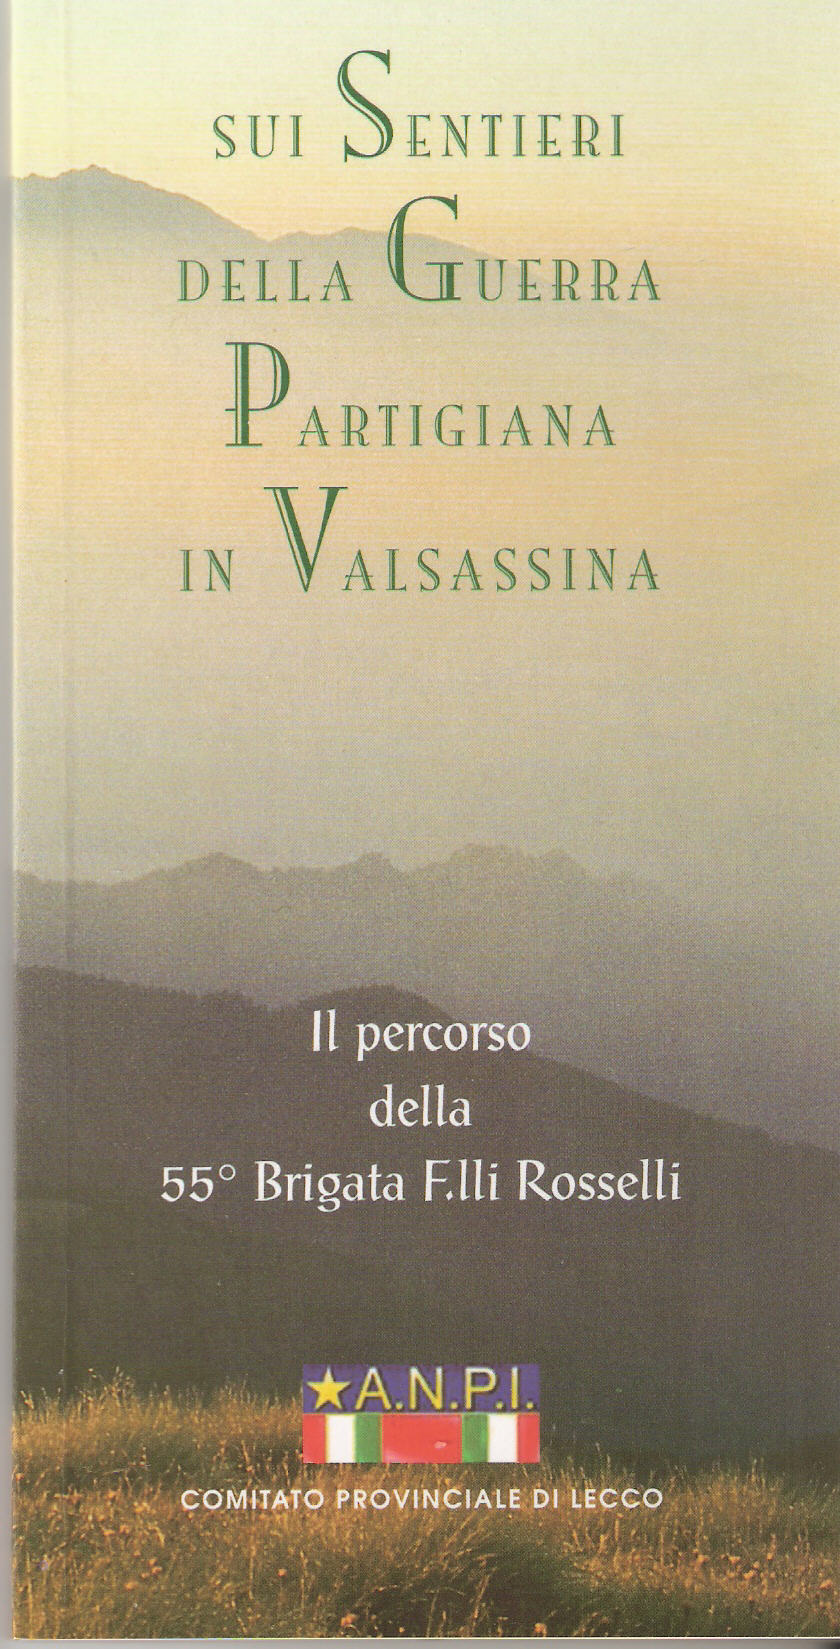 Sui sentieri della Guerra Partigiana in Valsassina